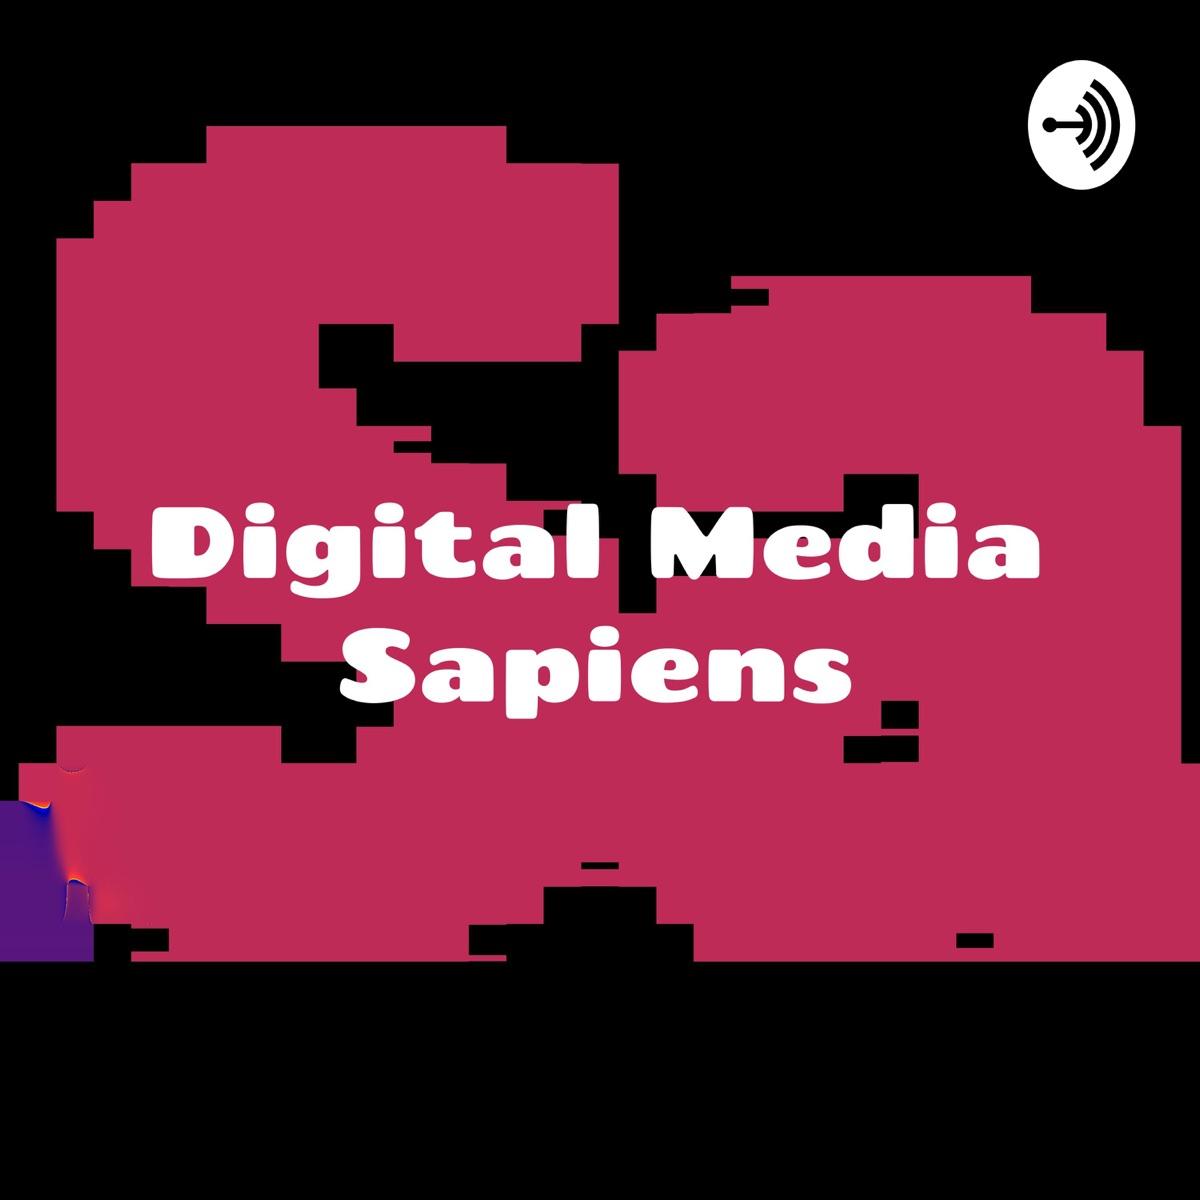 Digital Media Sapiens - Digital Marketing Agency Dubai